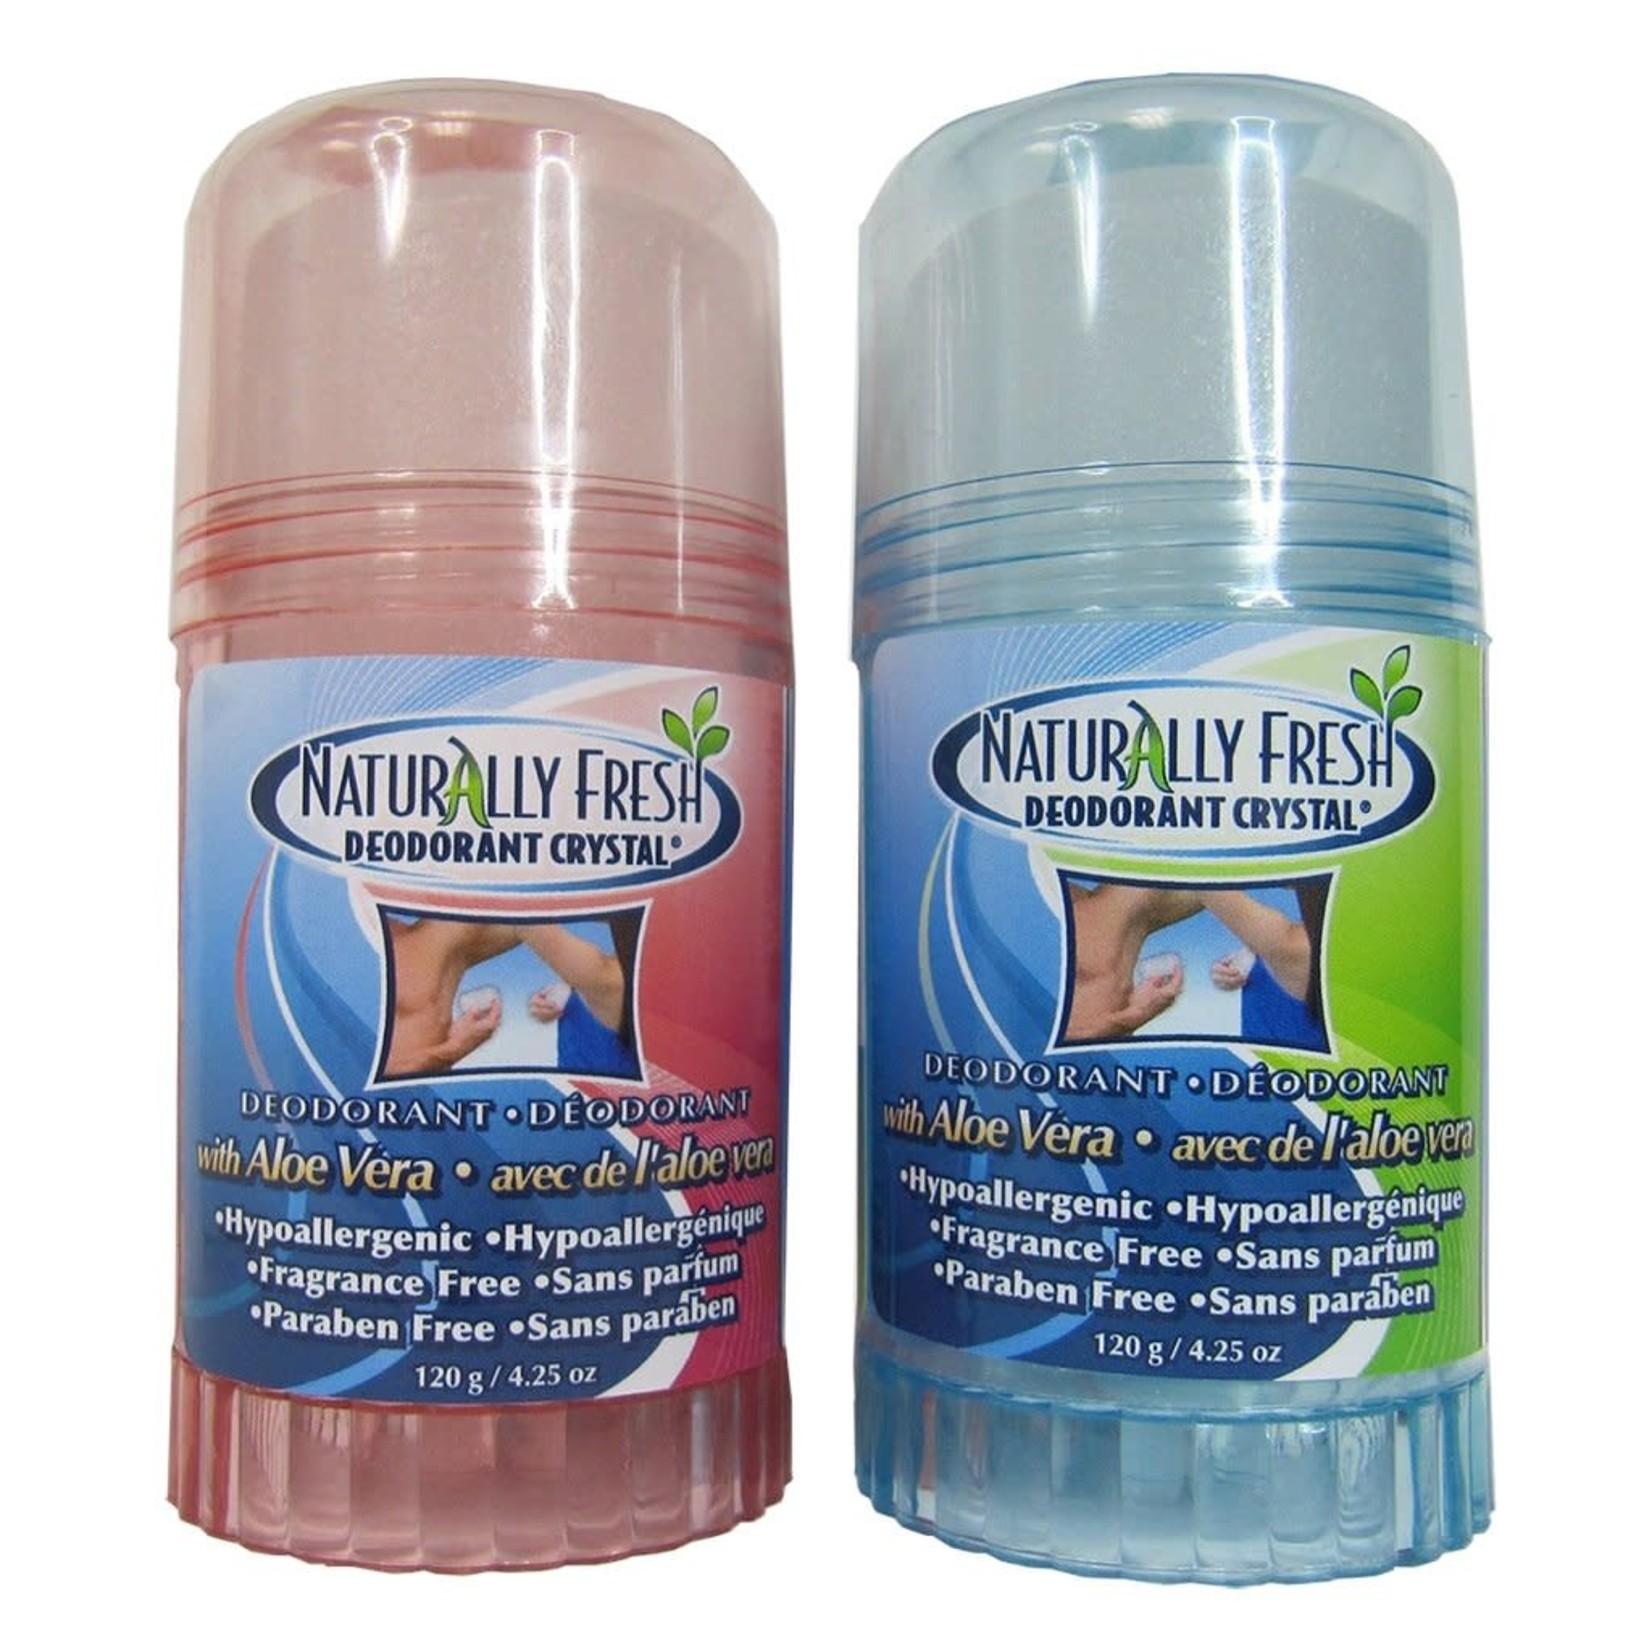 Naturally Fresh Naturally Fresh Fragrance Free Deodorant Crystal 120g